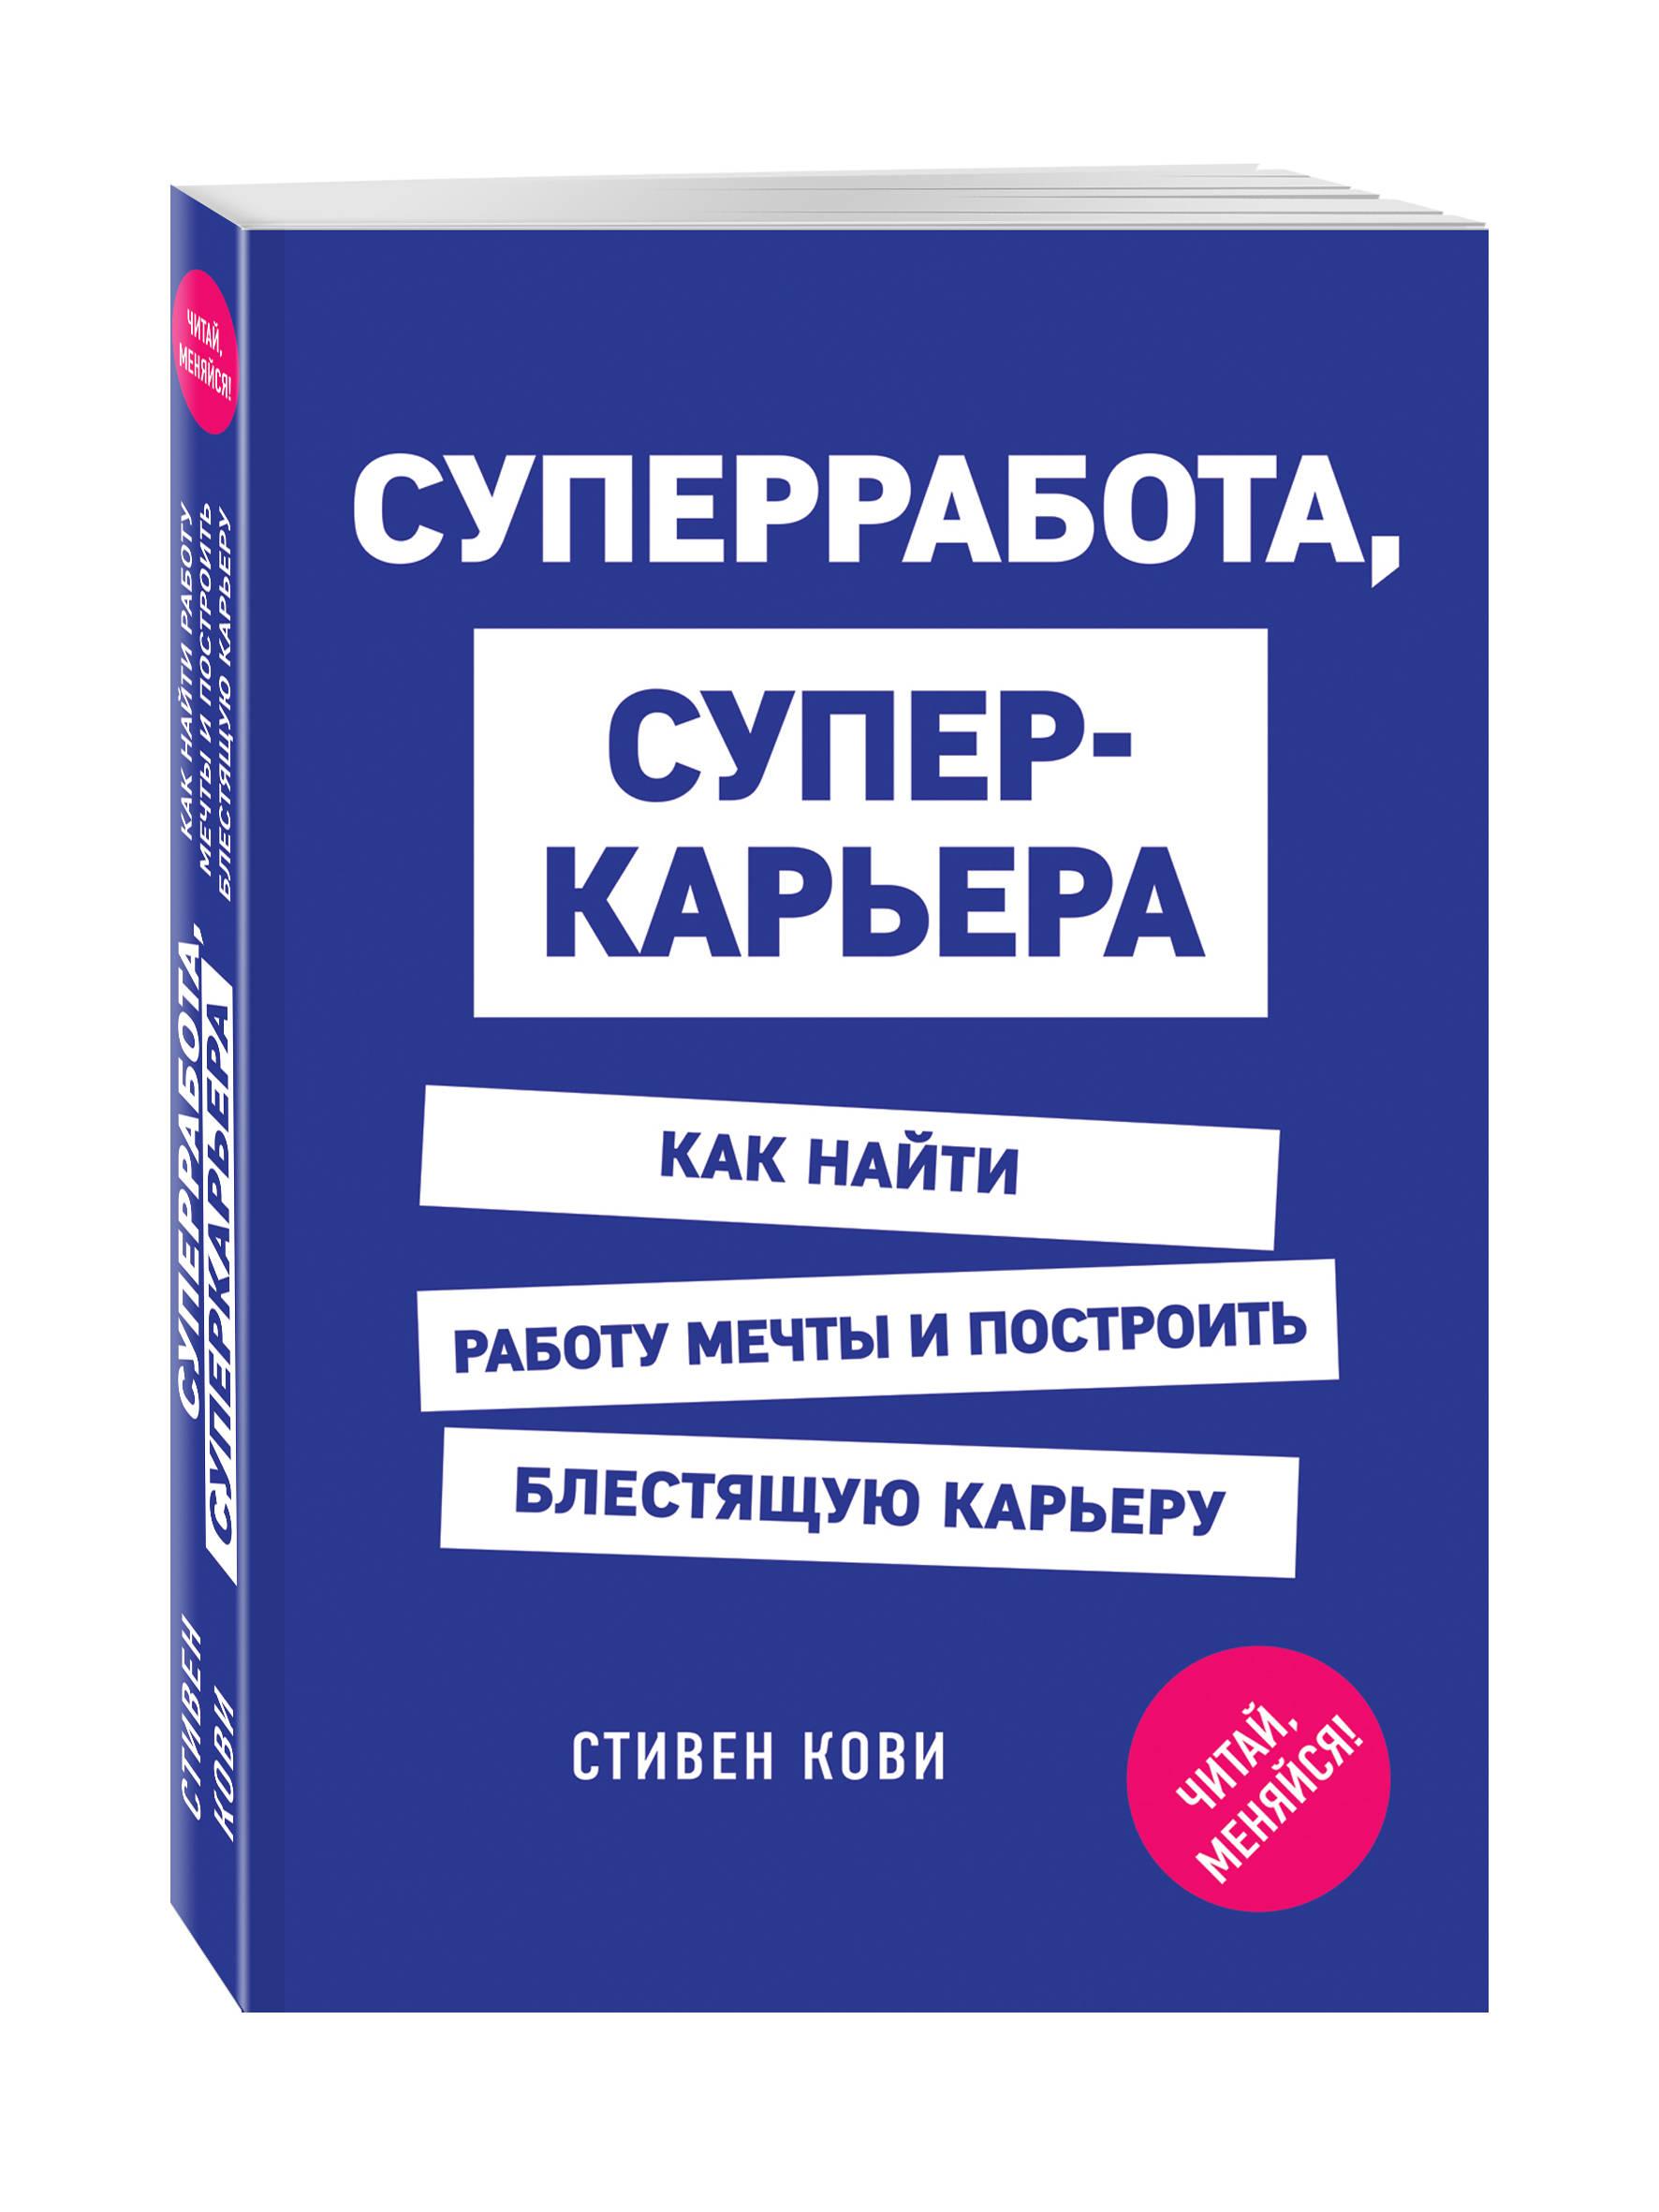 Суперработа, суперкарьера ( Стивен Кови, Дженнифер Колосимо  )